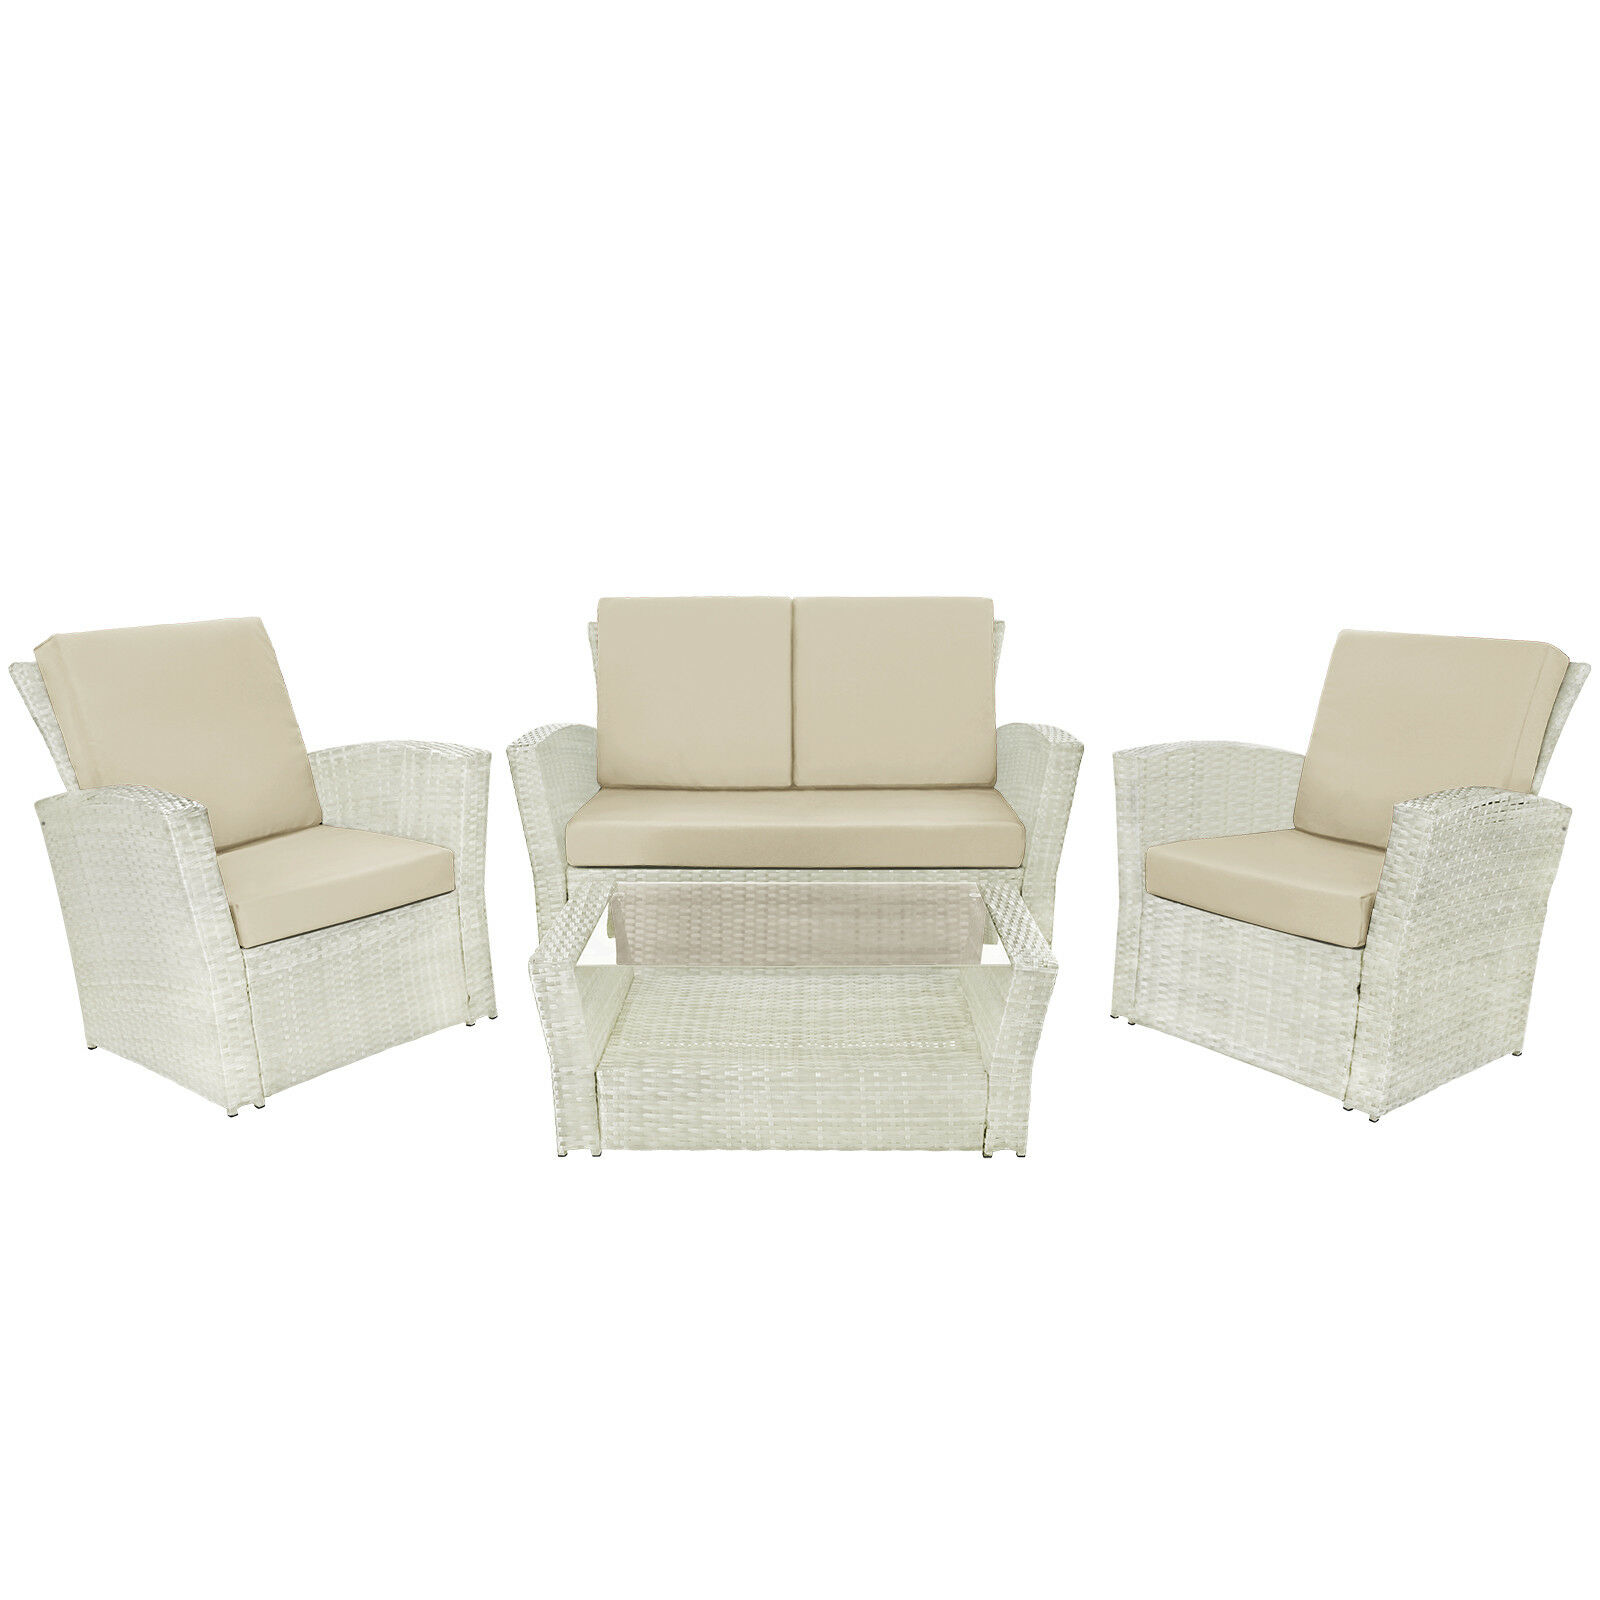 10-tlg Polyrattan Sitzgruppe Gartengarnitur Gartenmöbel Essgruppe - Farbe Farbe Farbe  Weiß 2886e3